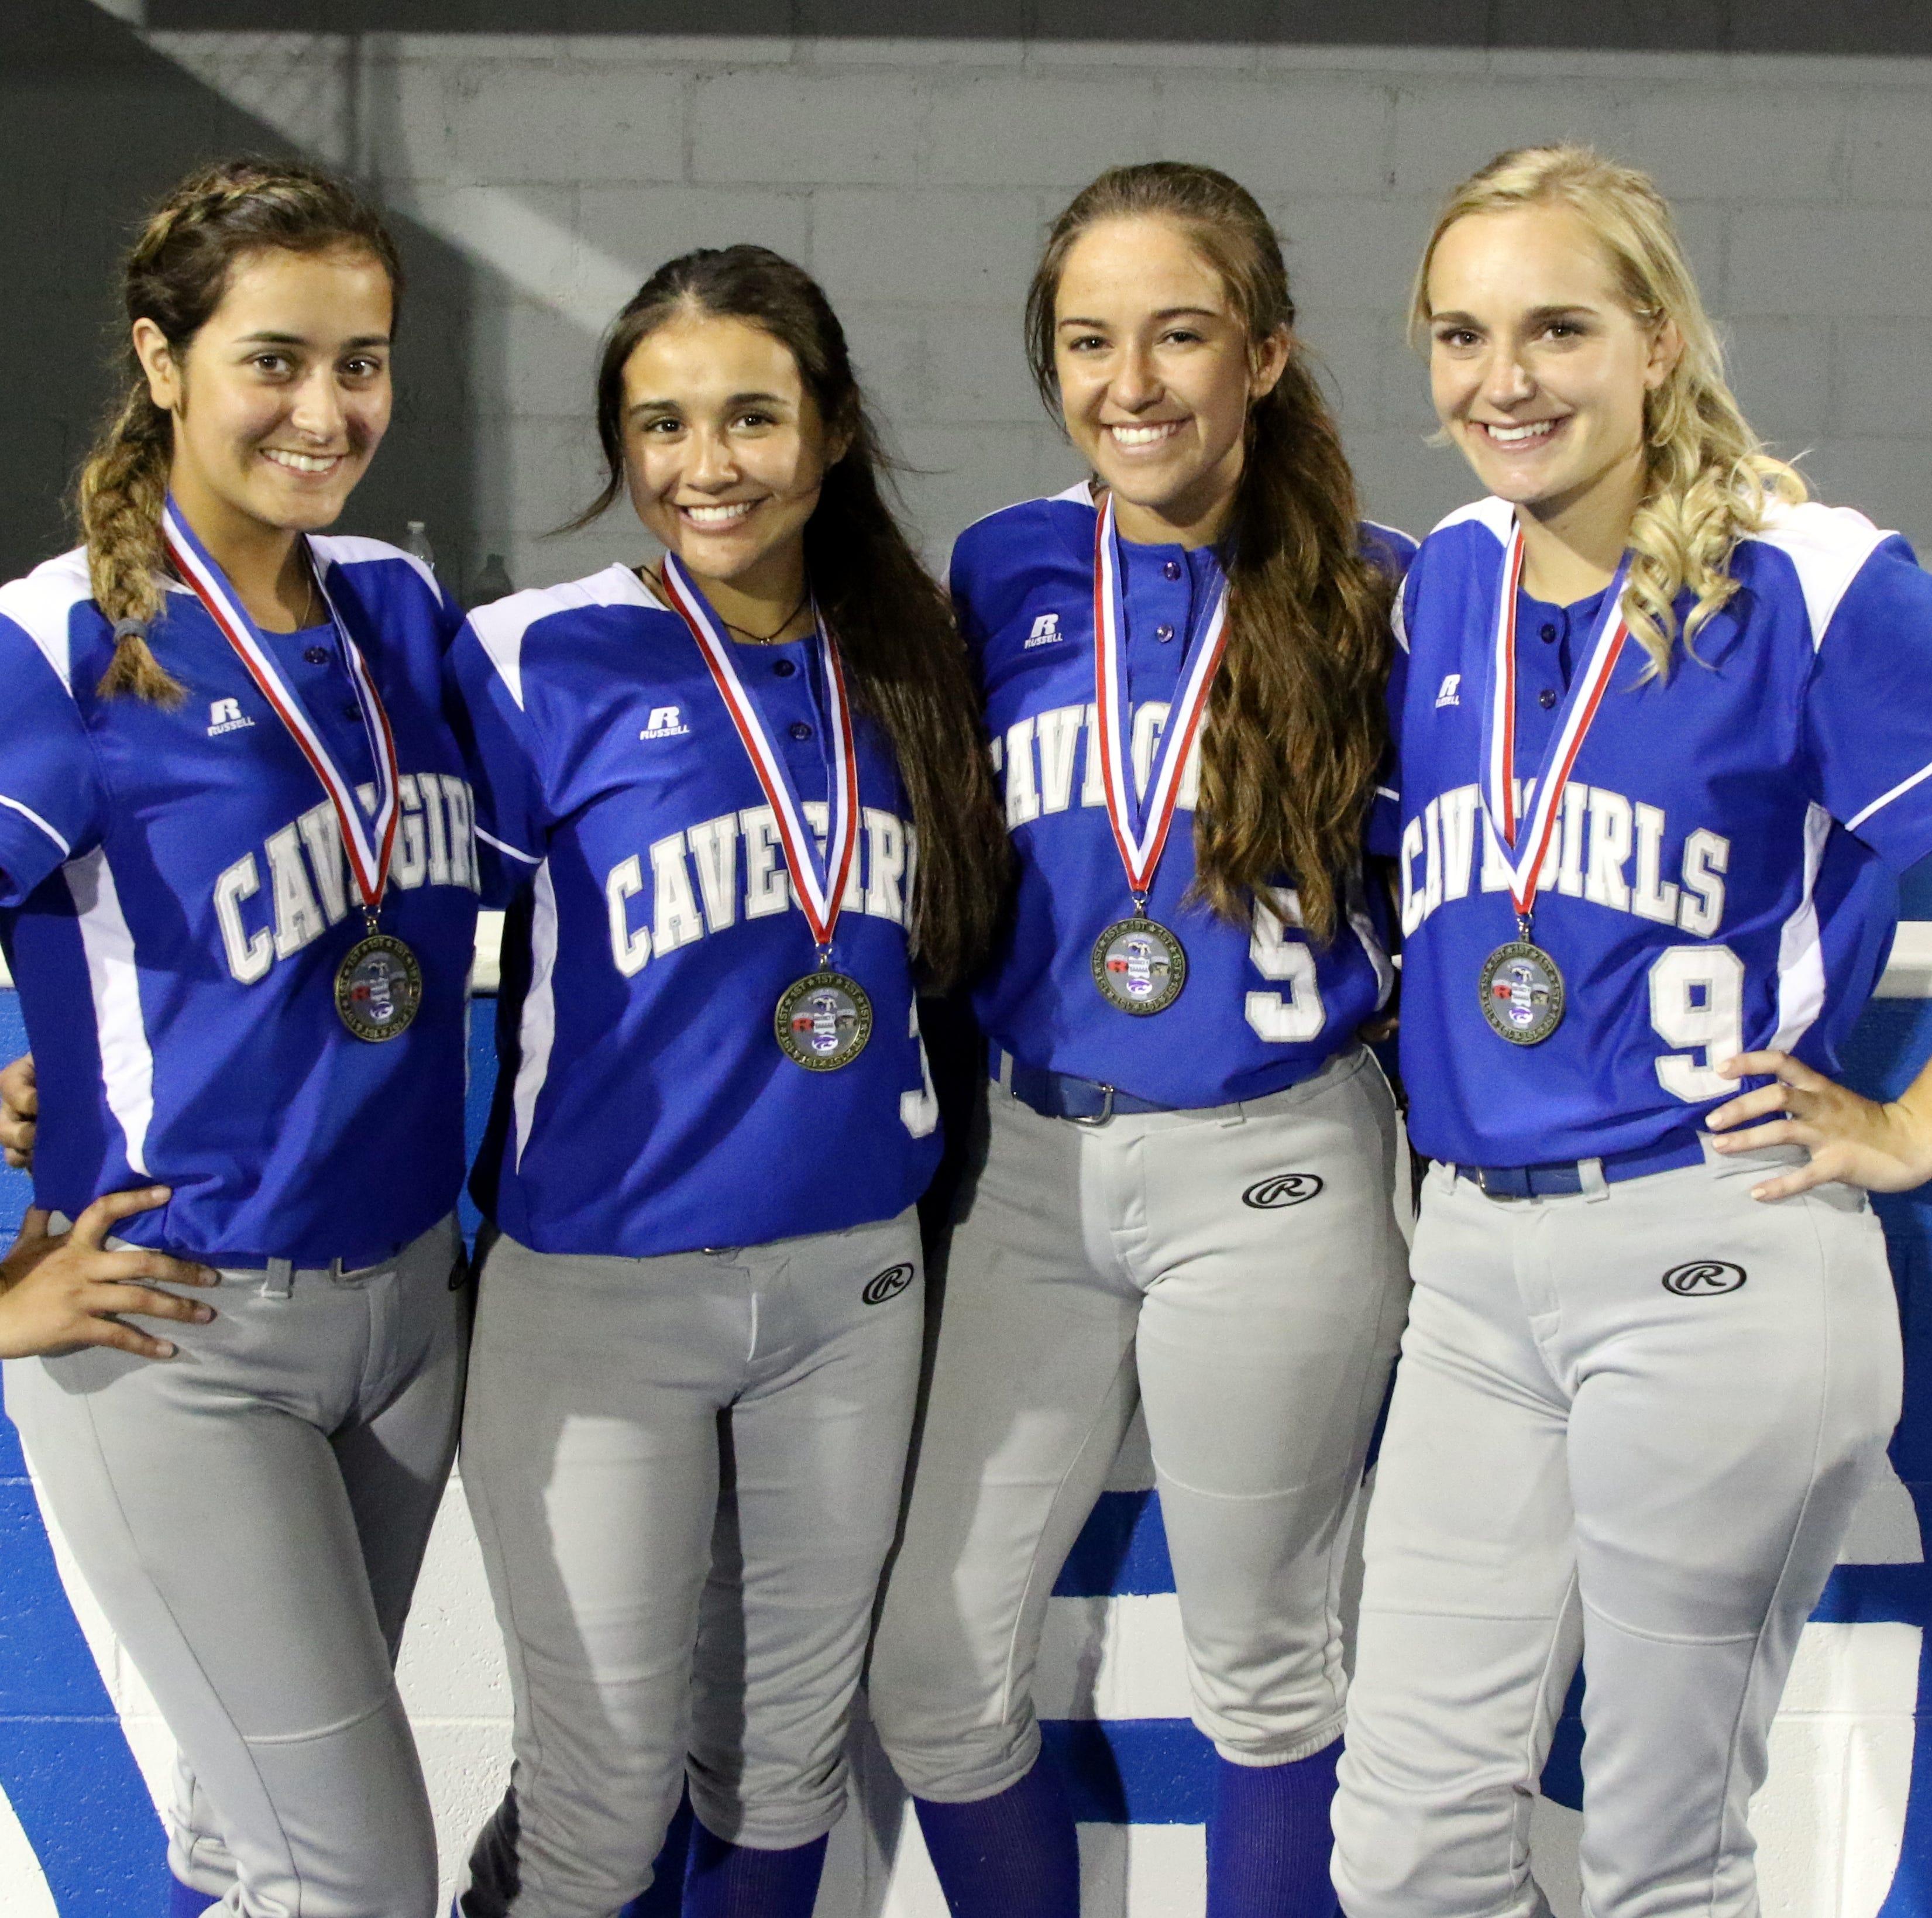 Cavegirls offense led by its senior players